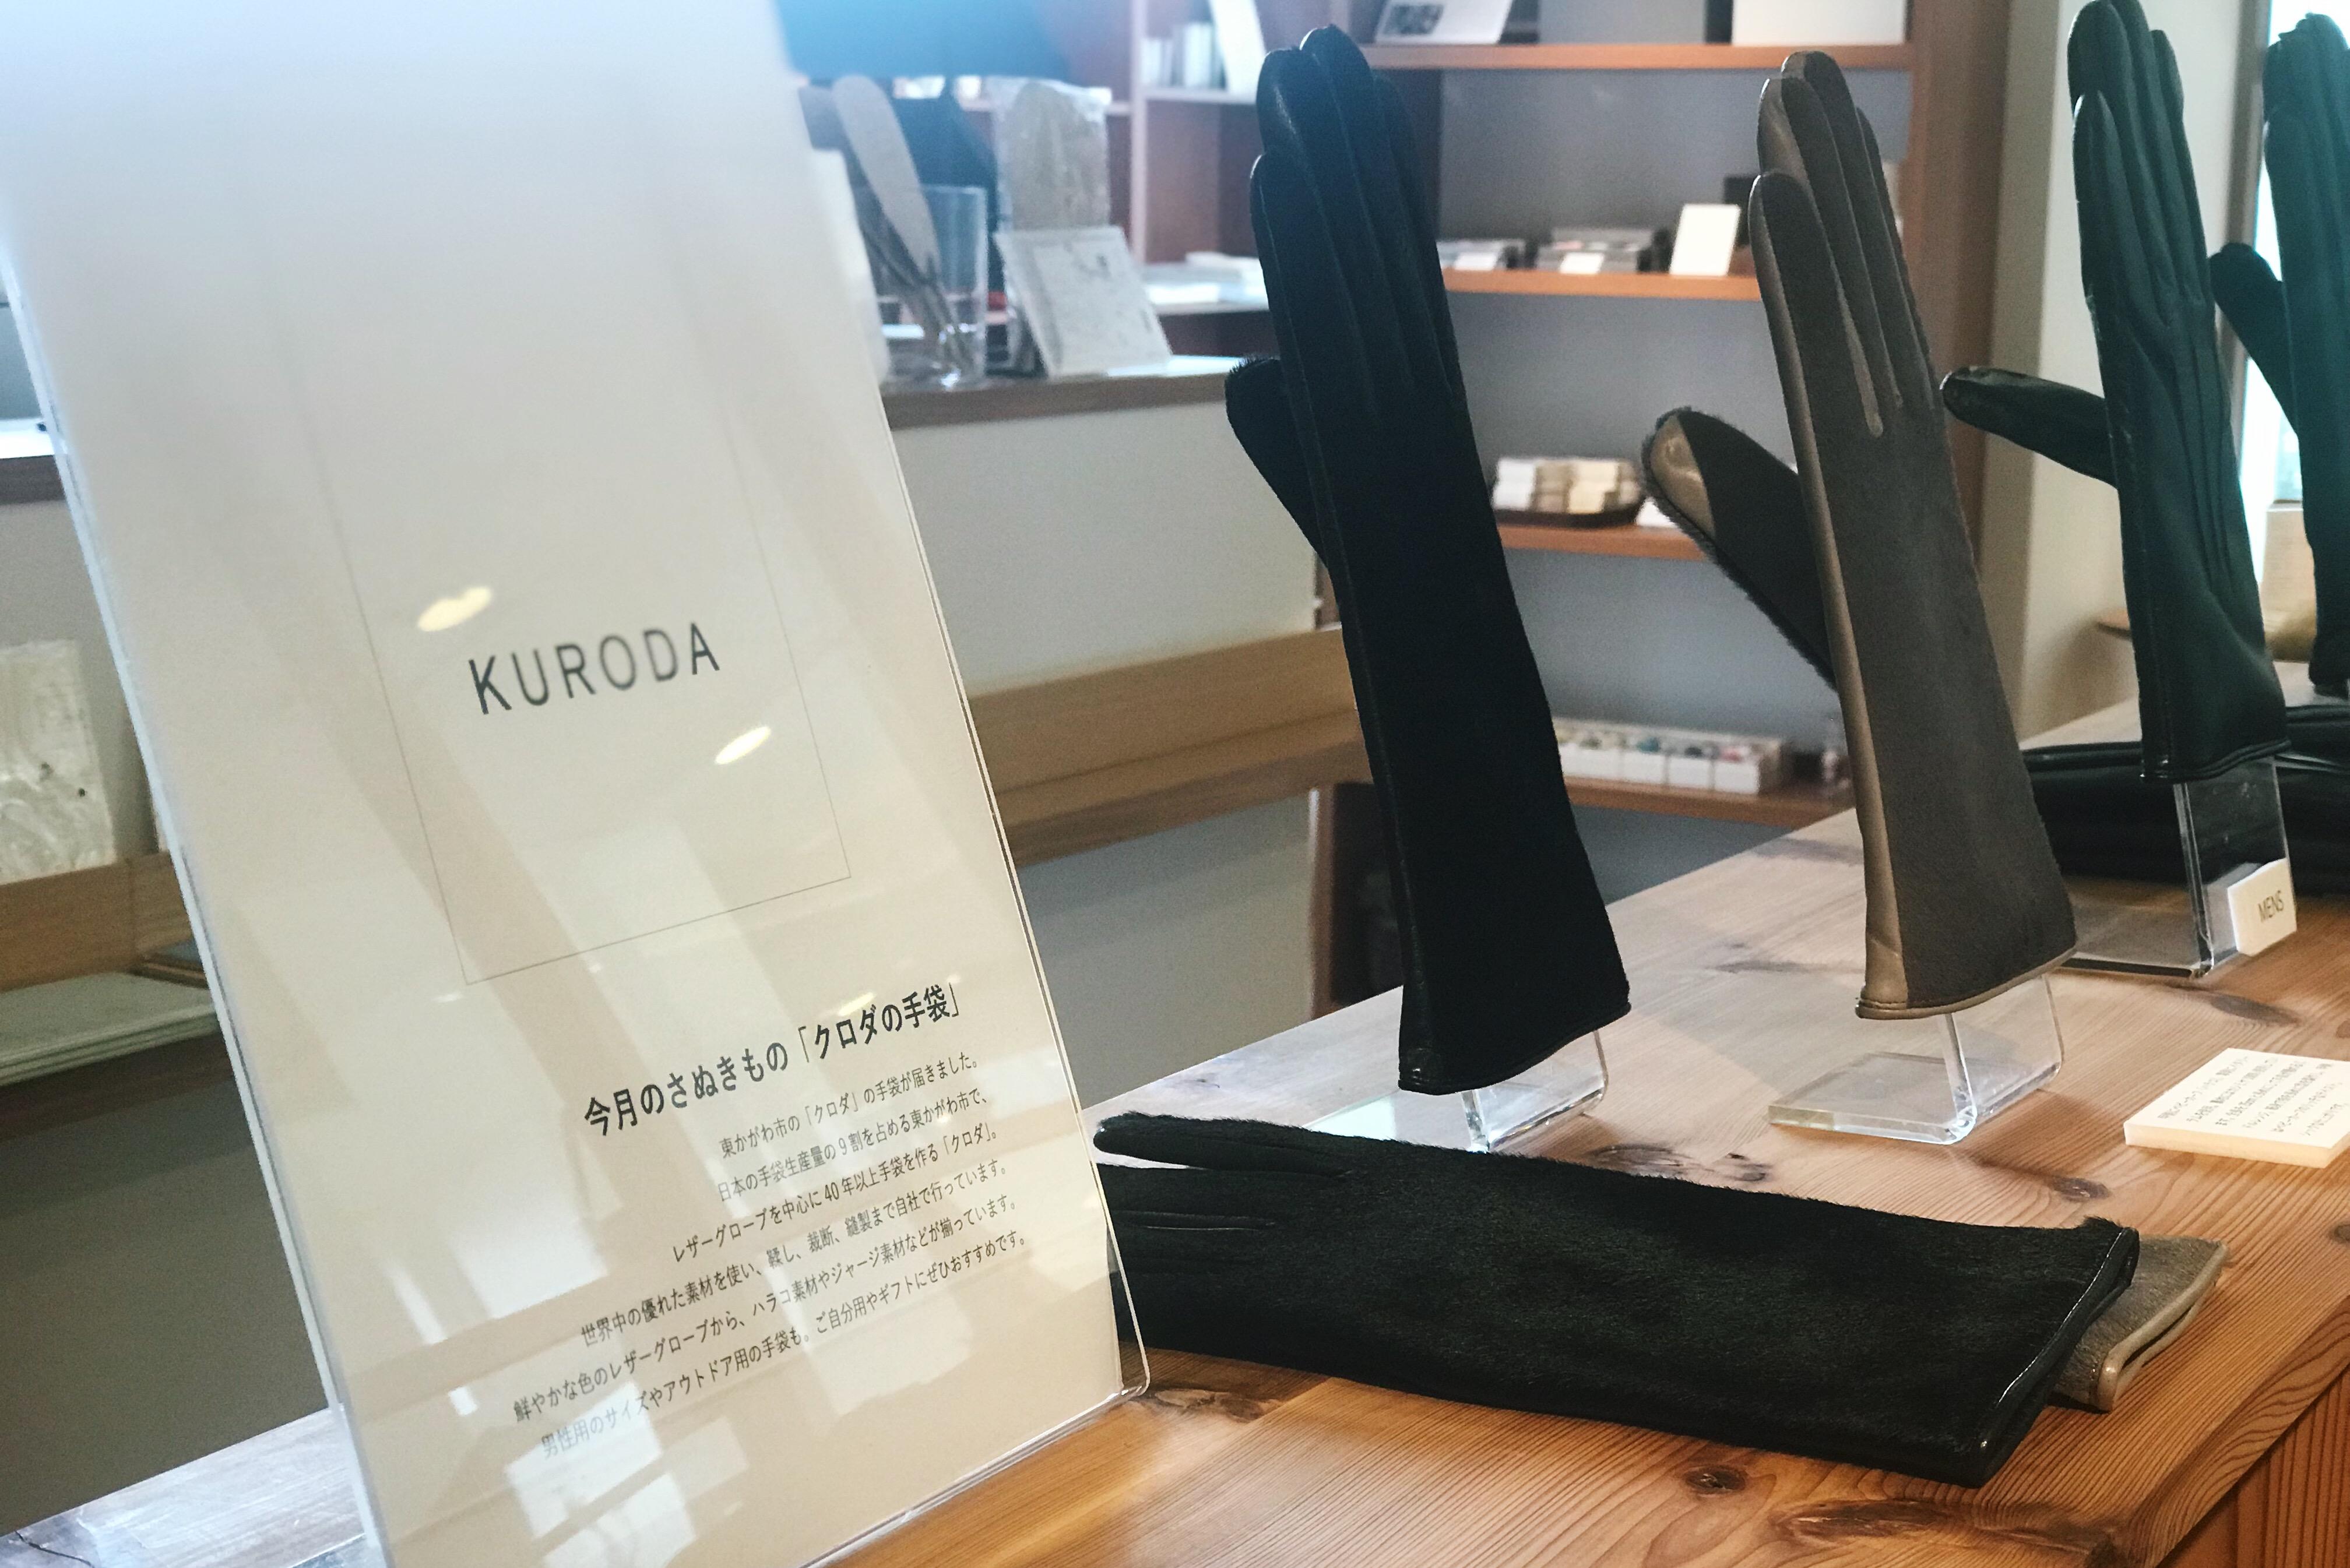 https://www.schule.jp/hibinokoto/kuroda_tebukuro5.JPG